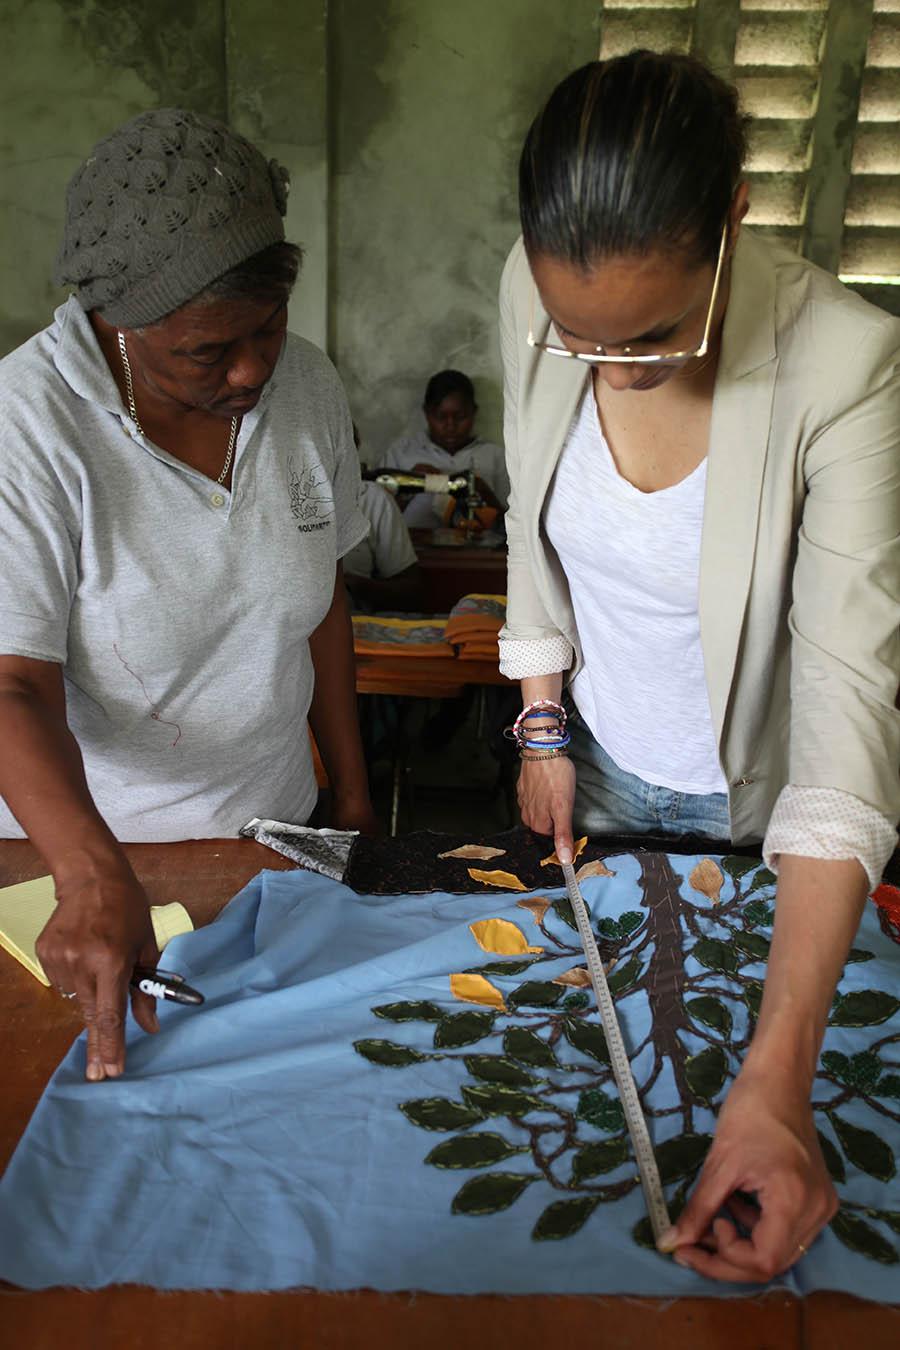 Griot Magazine-Stella JEan in Haiti - Ethical Fashion Initiative